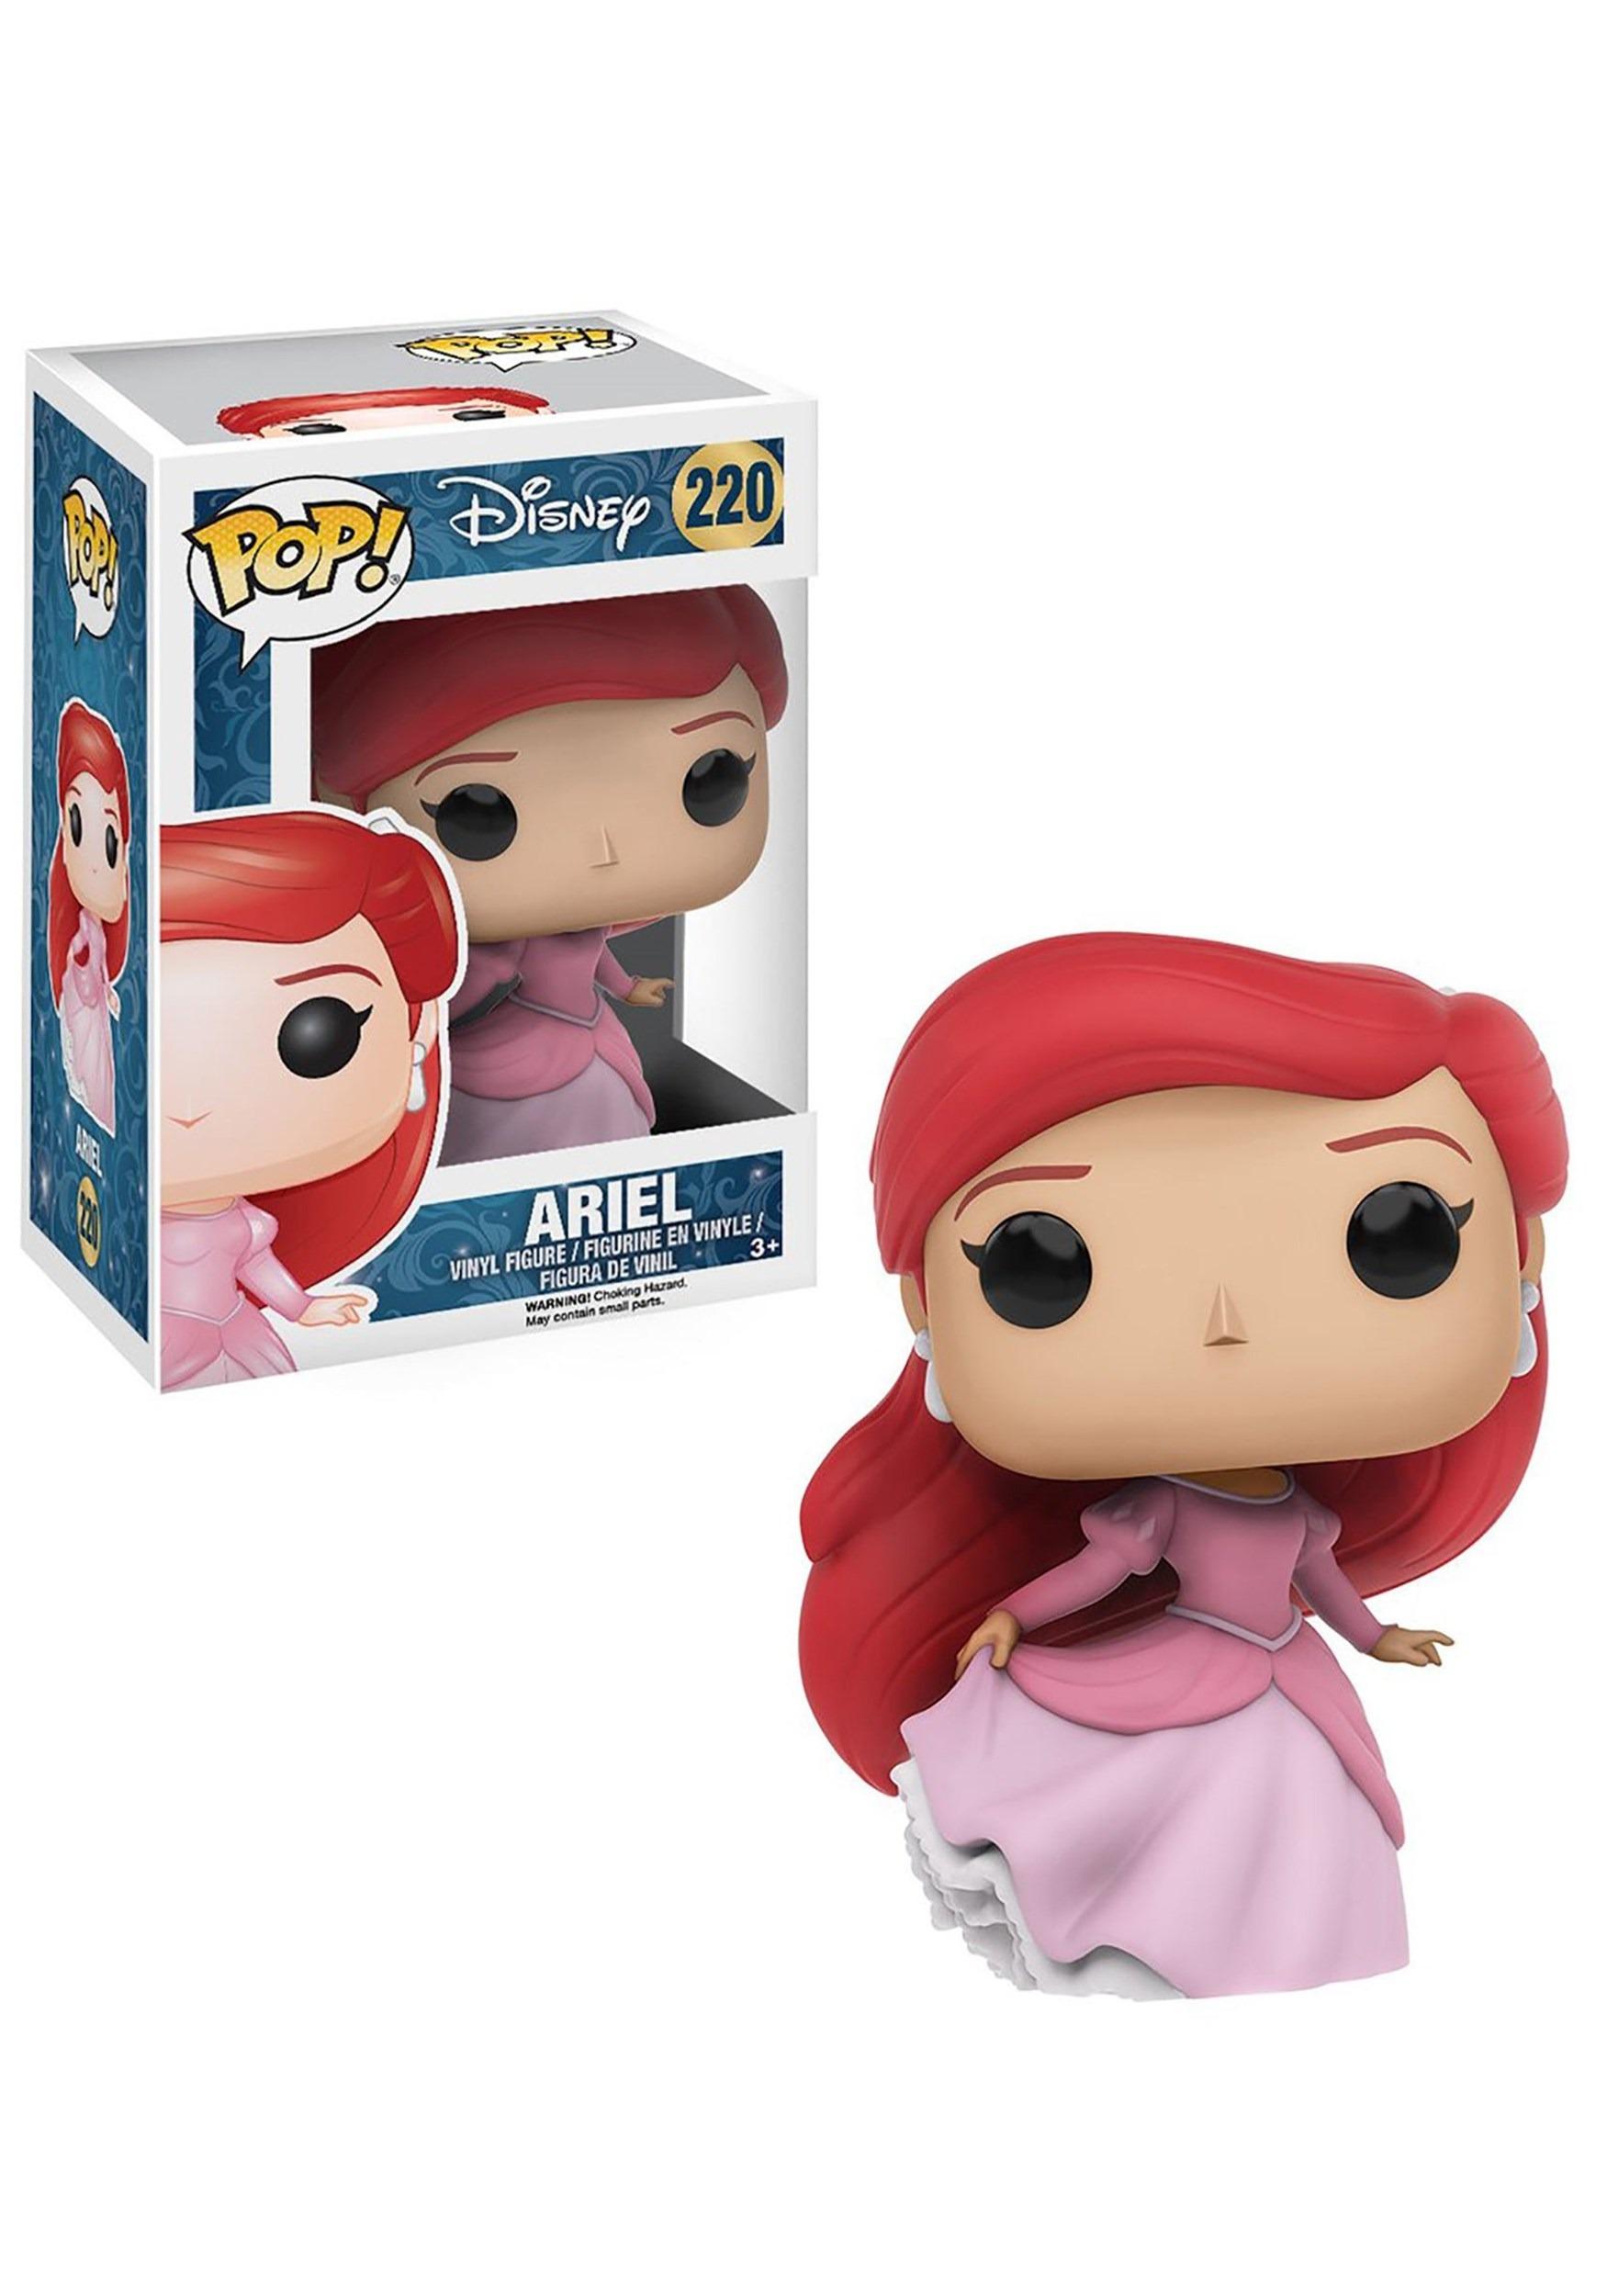 Disney The Little Mermaid Princess Ariel POP Vinyl Figure